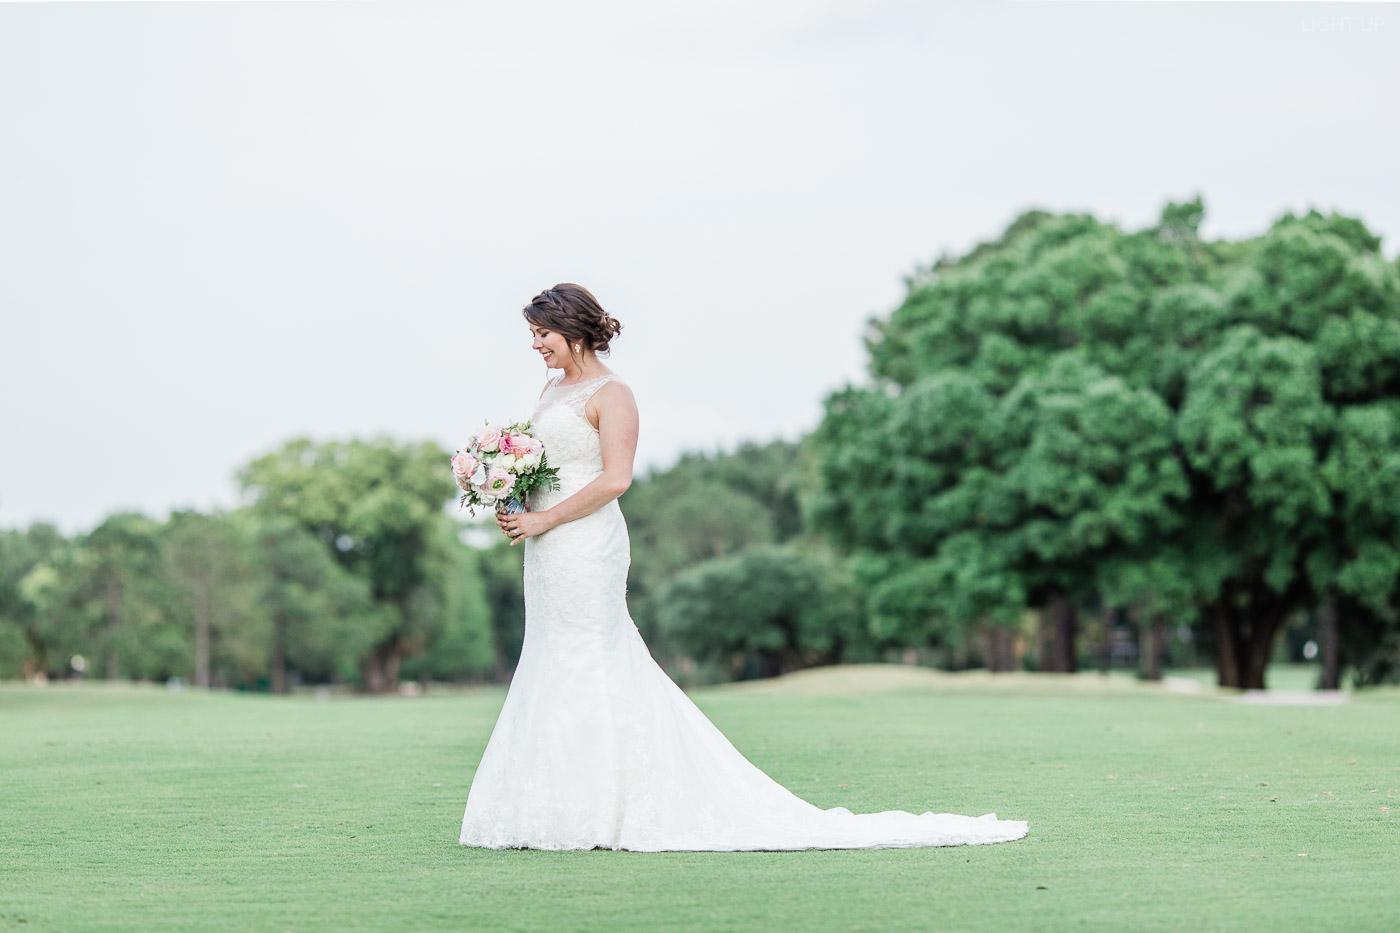 hstoric-dubsdread-wedding-orlando-27.jpg